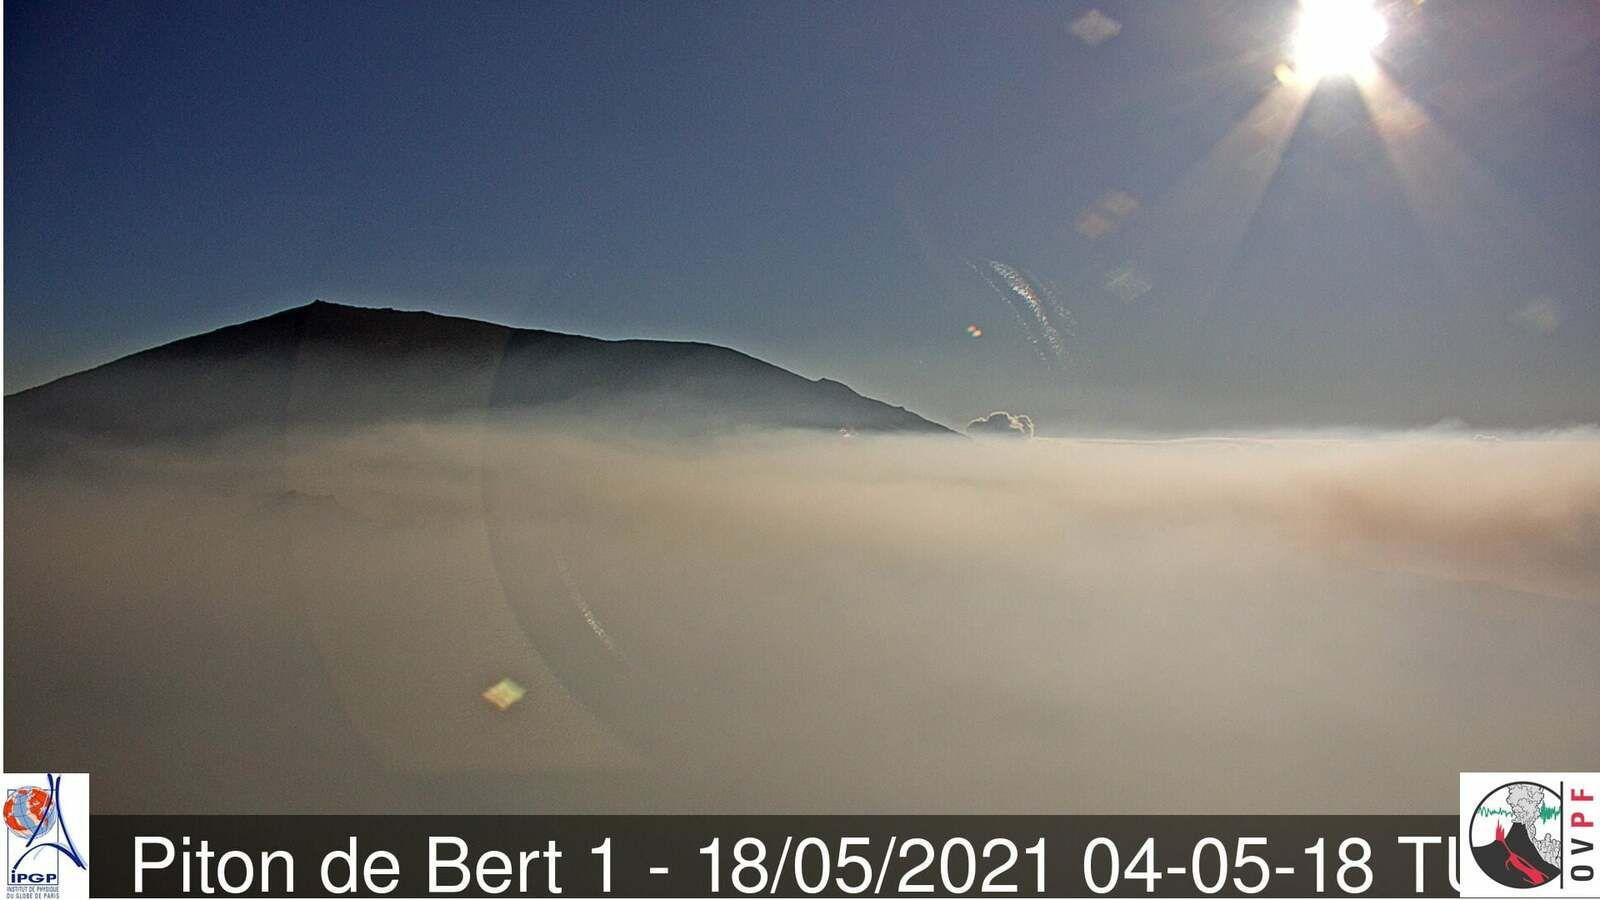 Piton de La Fournaise - 05/18/2021 / 04:05 TU- OVPF  webcam Piton de Bert